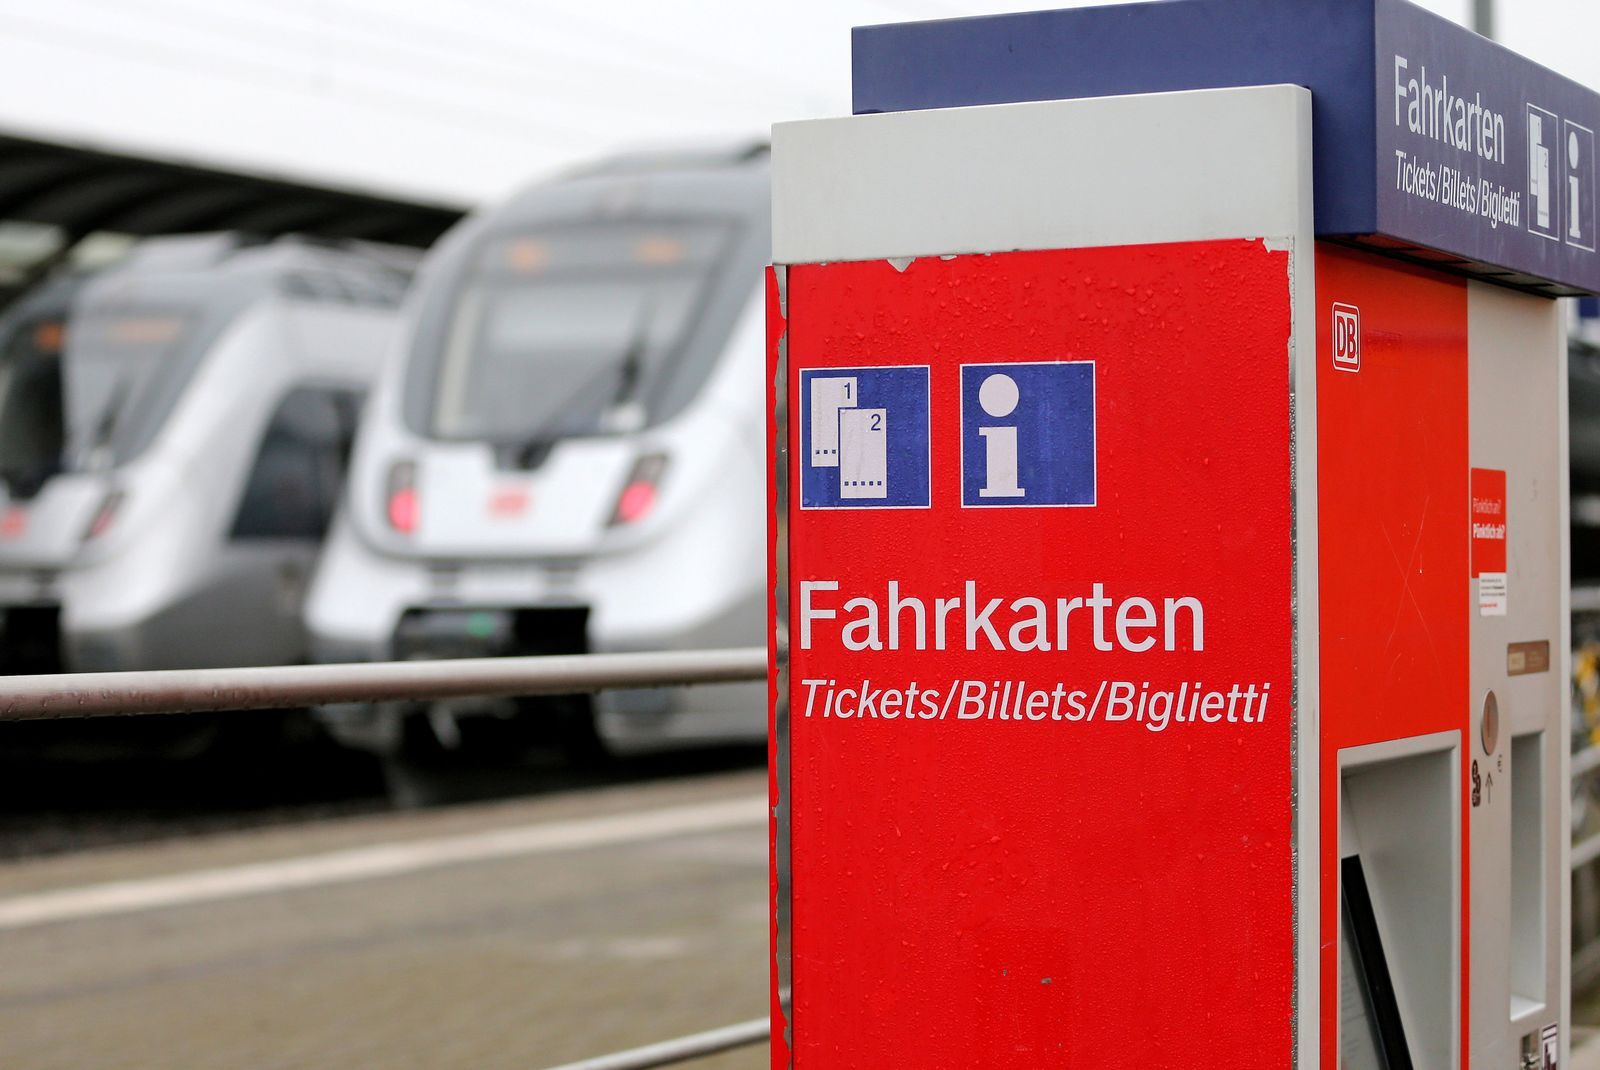 Deutsche Bahn / Fahrkartenautomat / Ticket